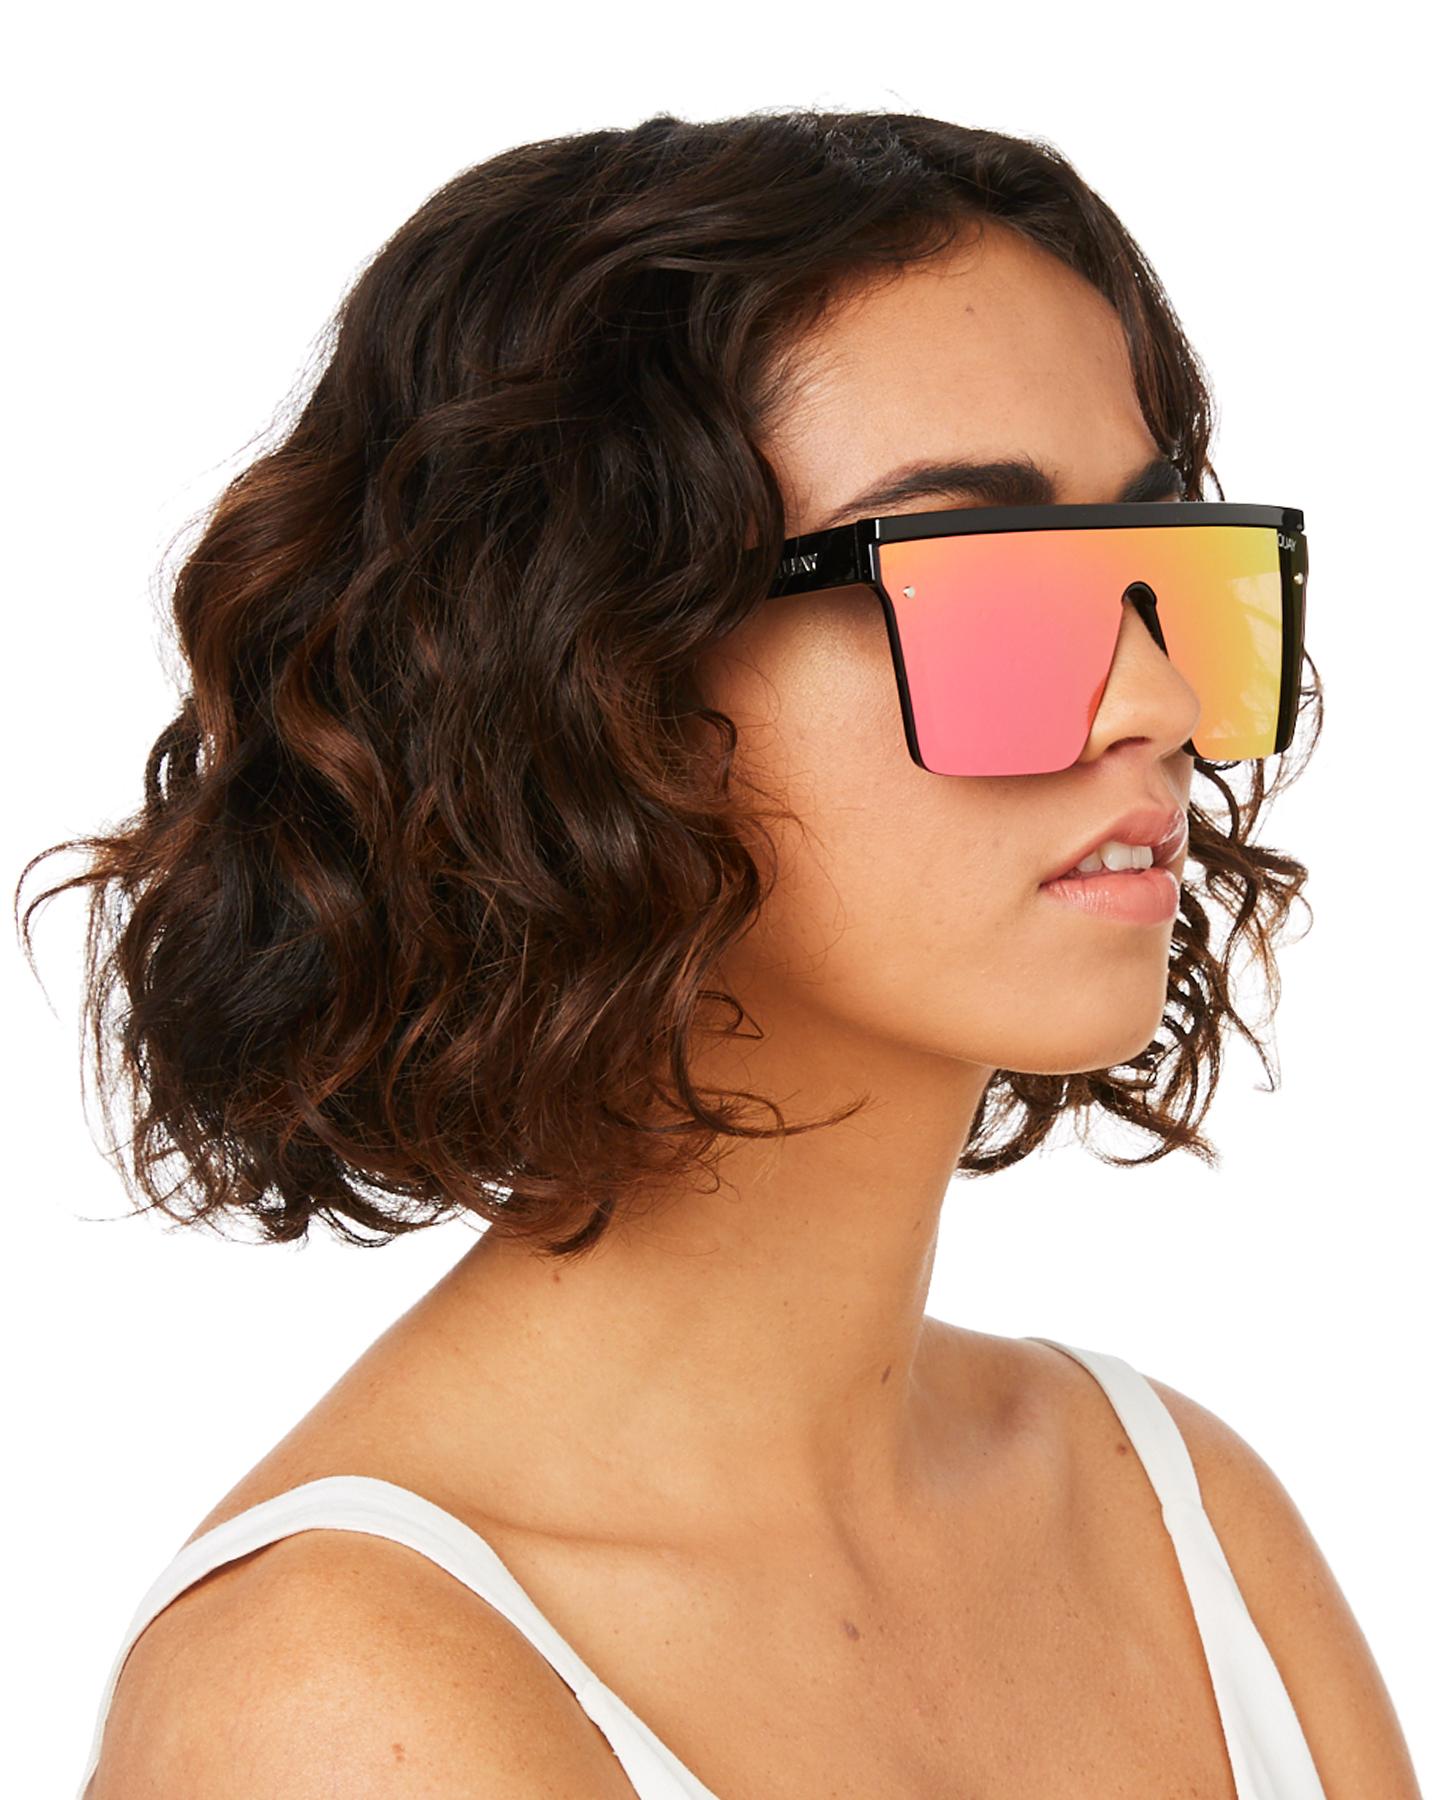 New-Quay-Eyewear-Women-039-s-Hindsight-Sunglasses-Stainless-Steel-Glass-Pink thumbnail 15